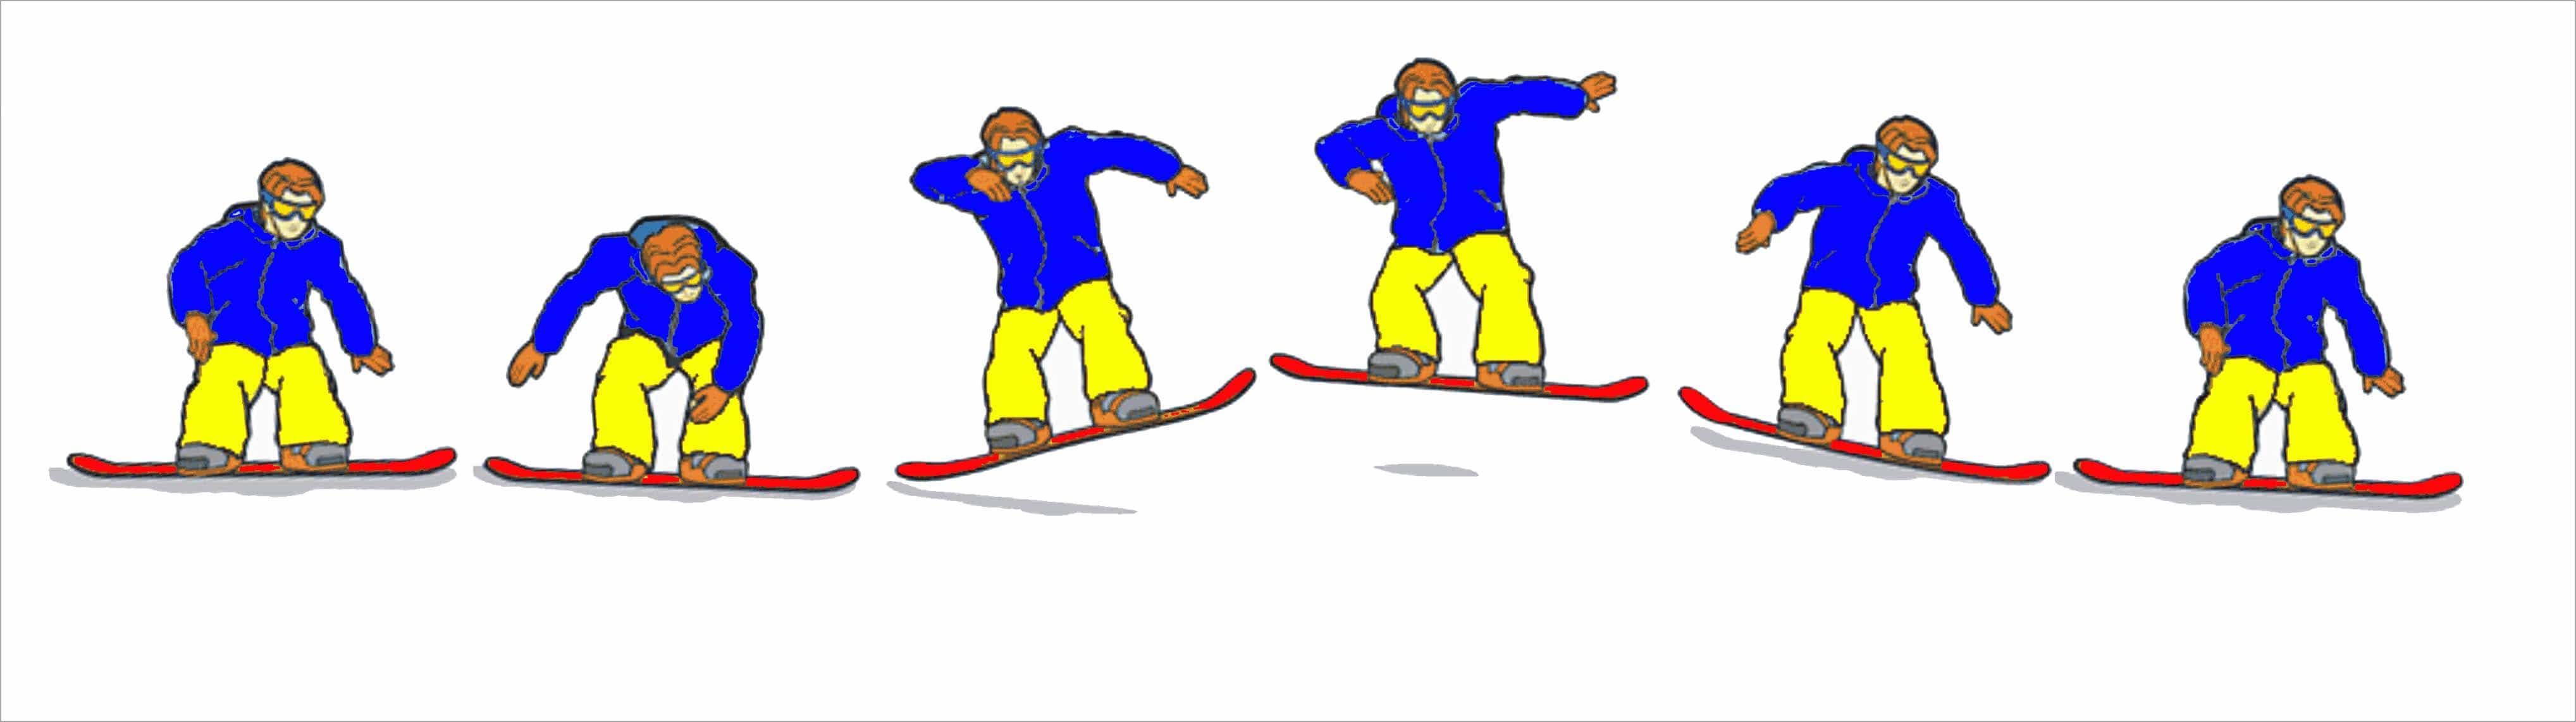 ollie snowboardholics